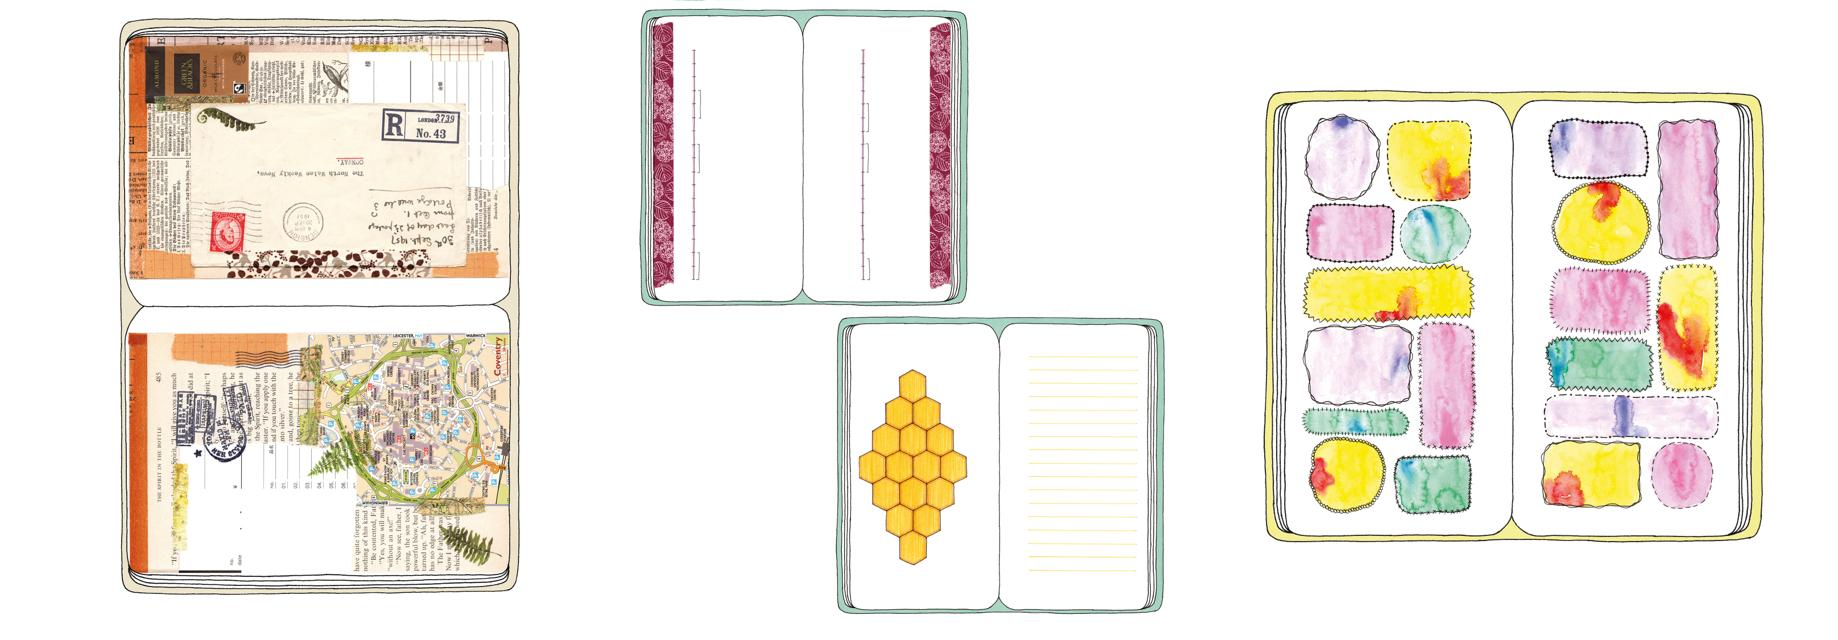 journaling book guide